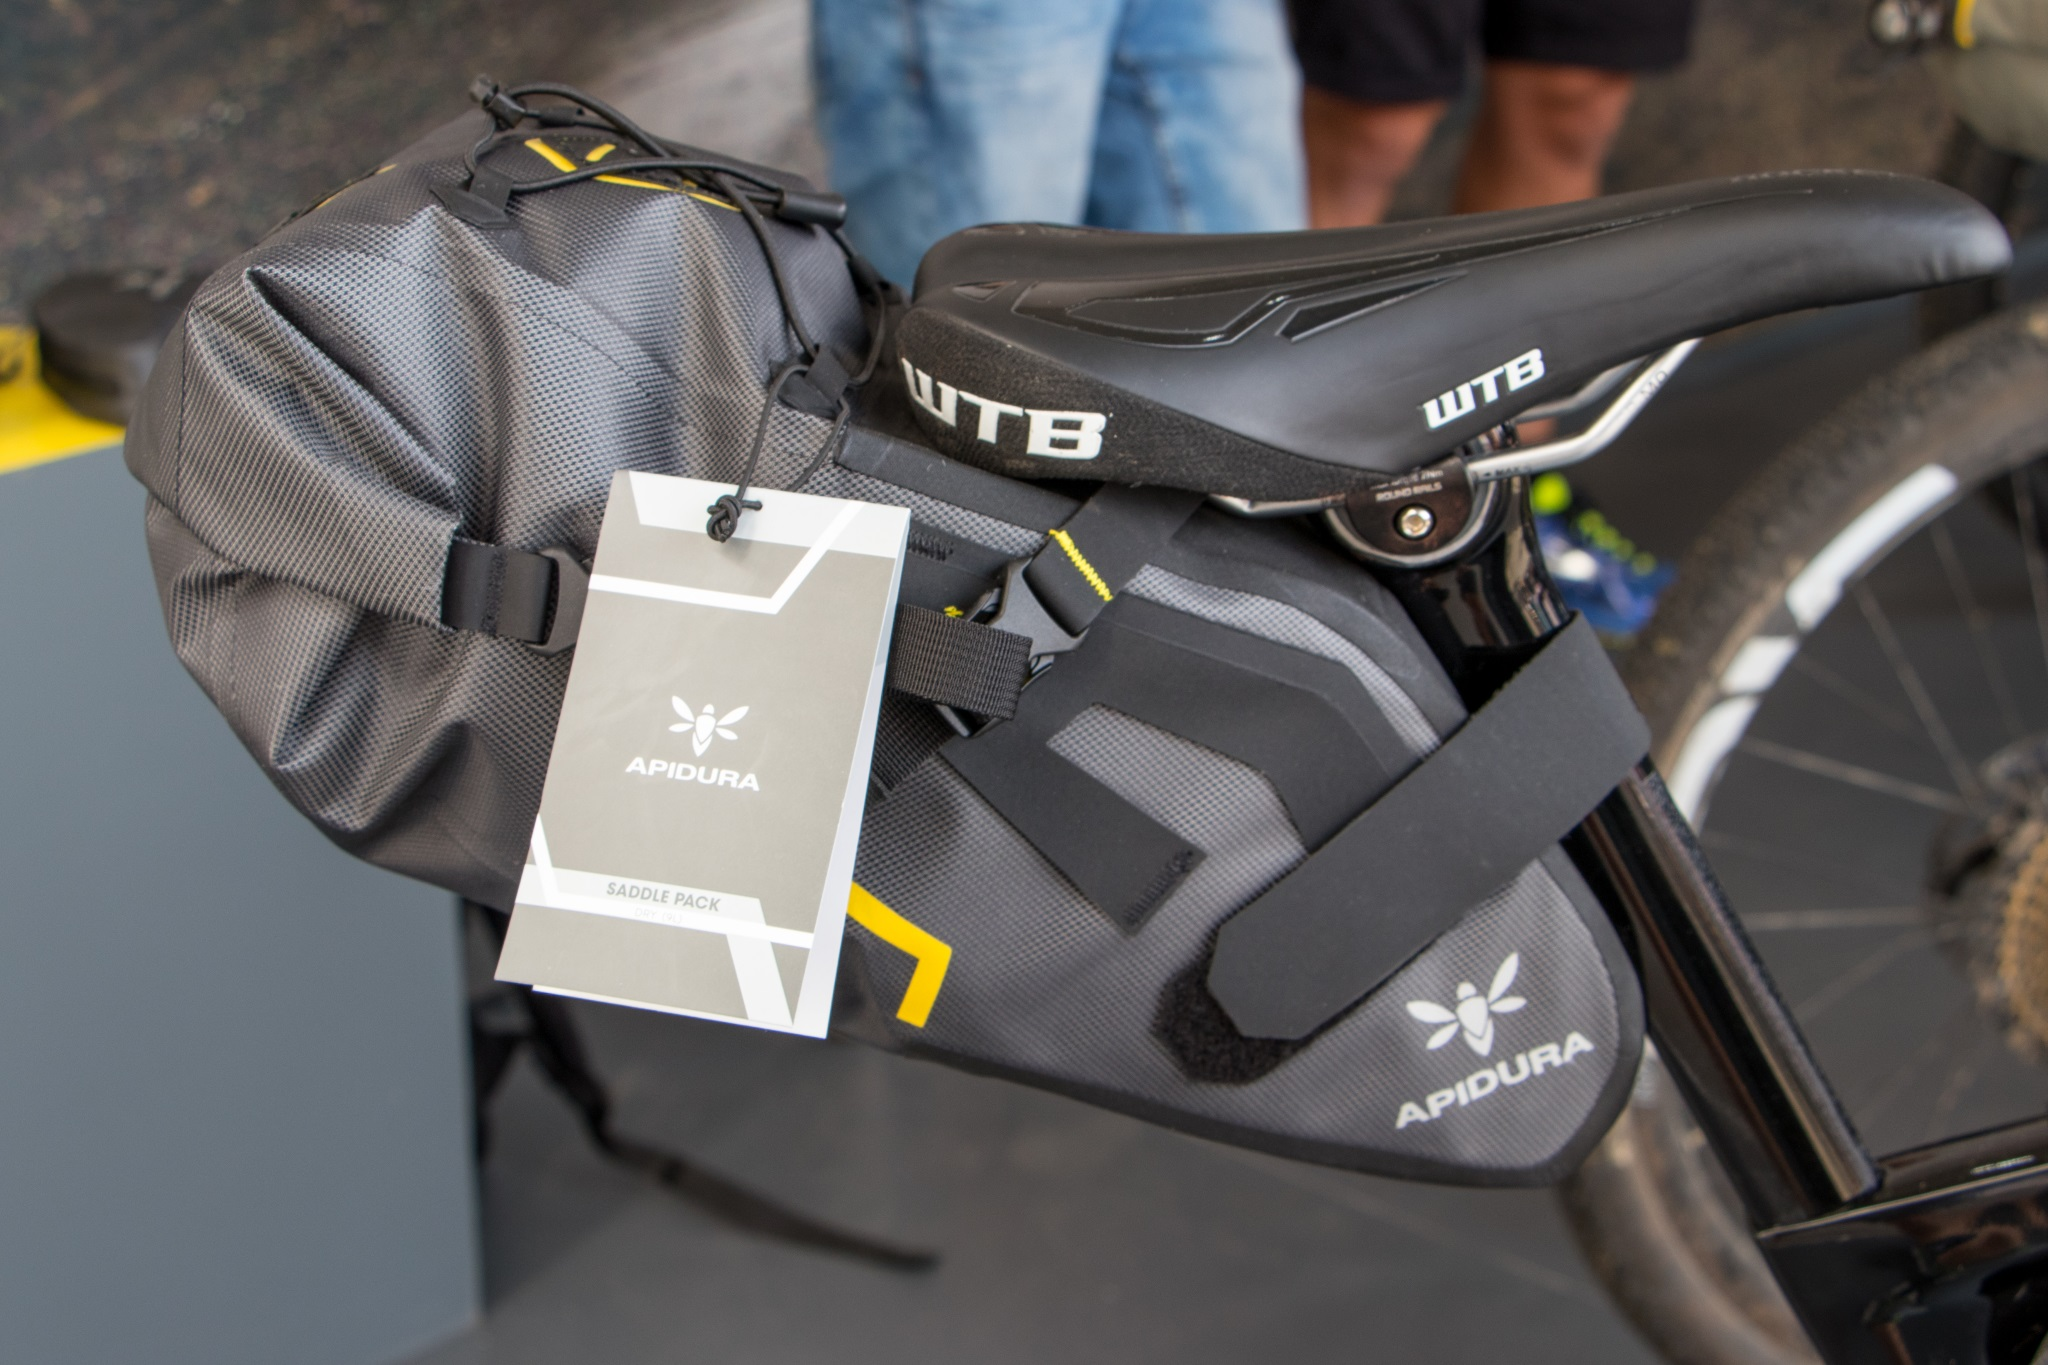 apidura_eurobike_bikepacking006